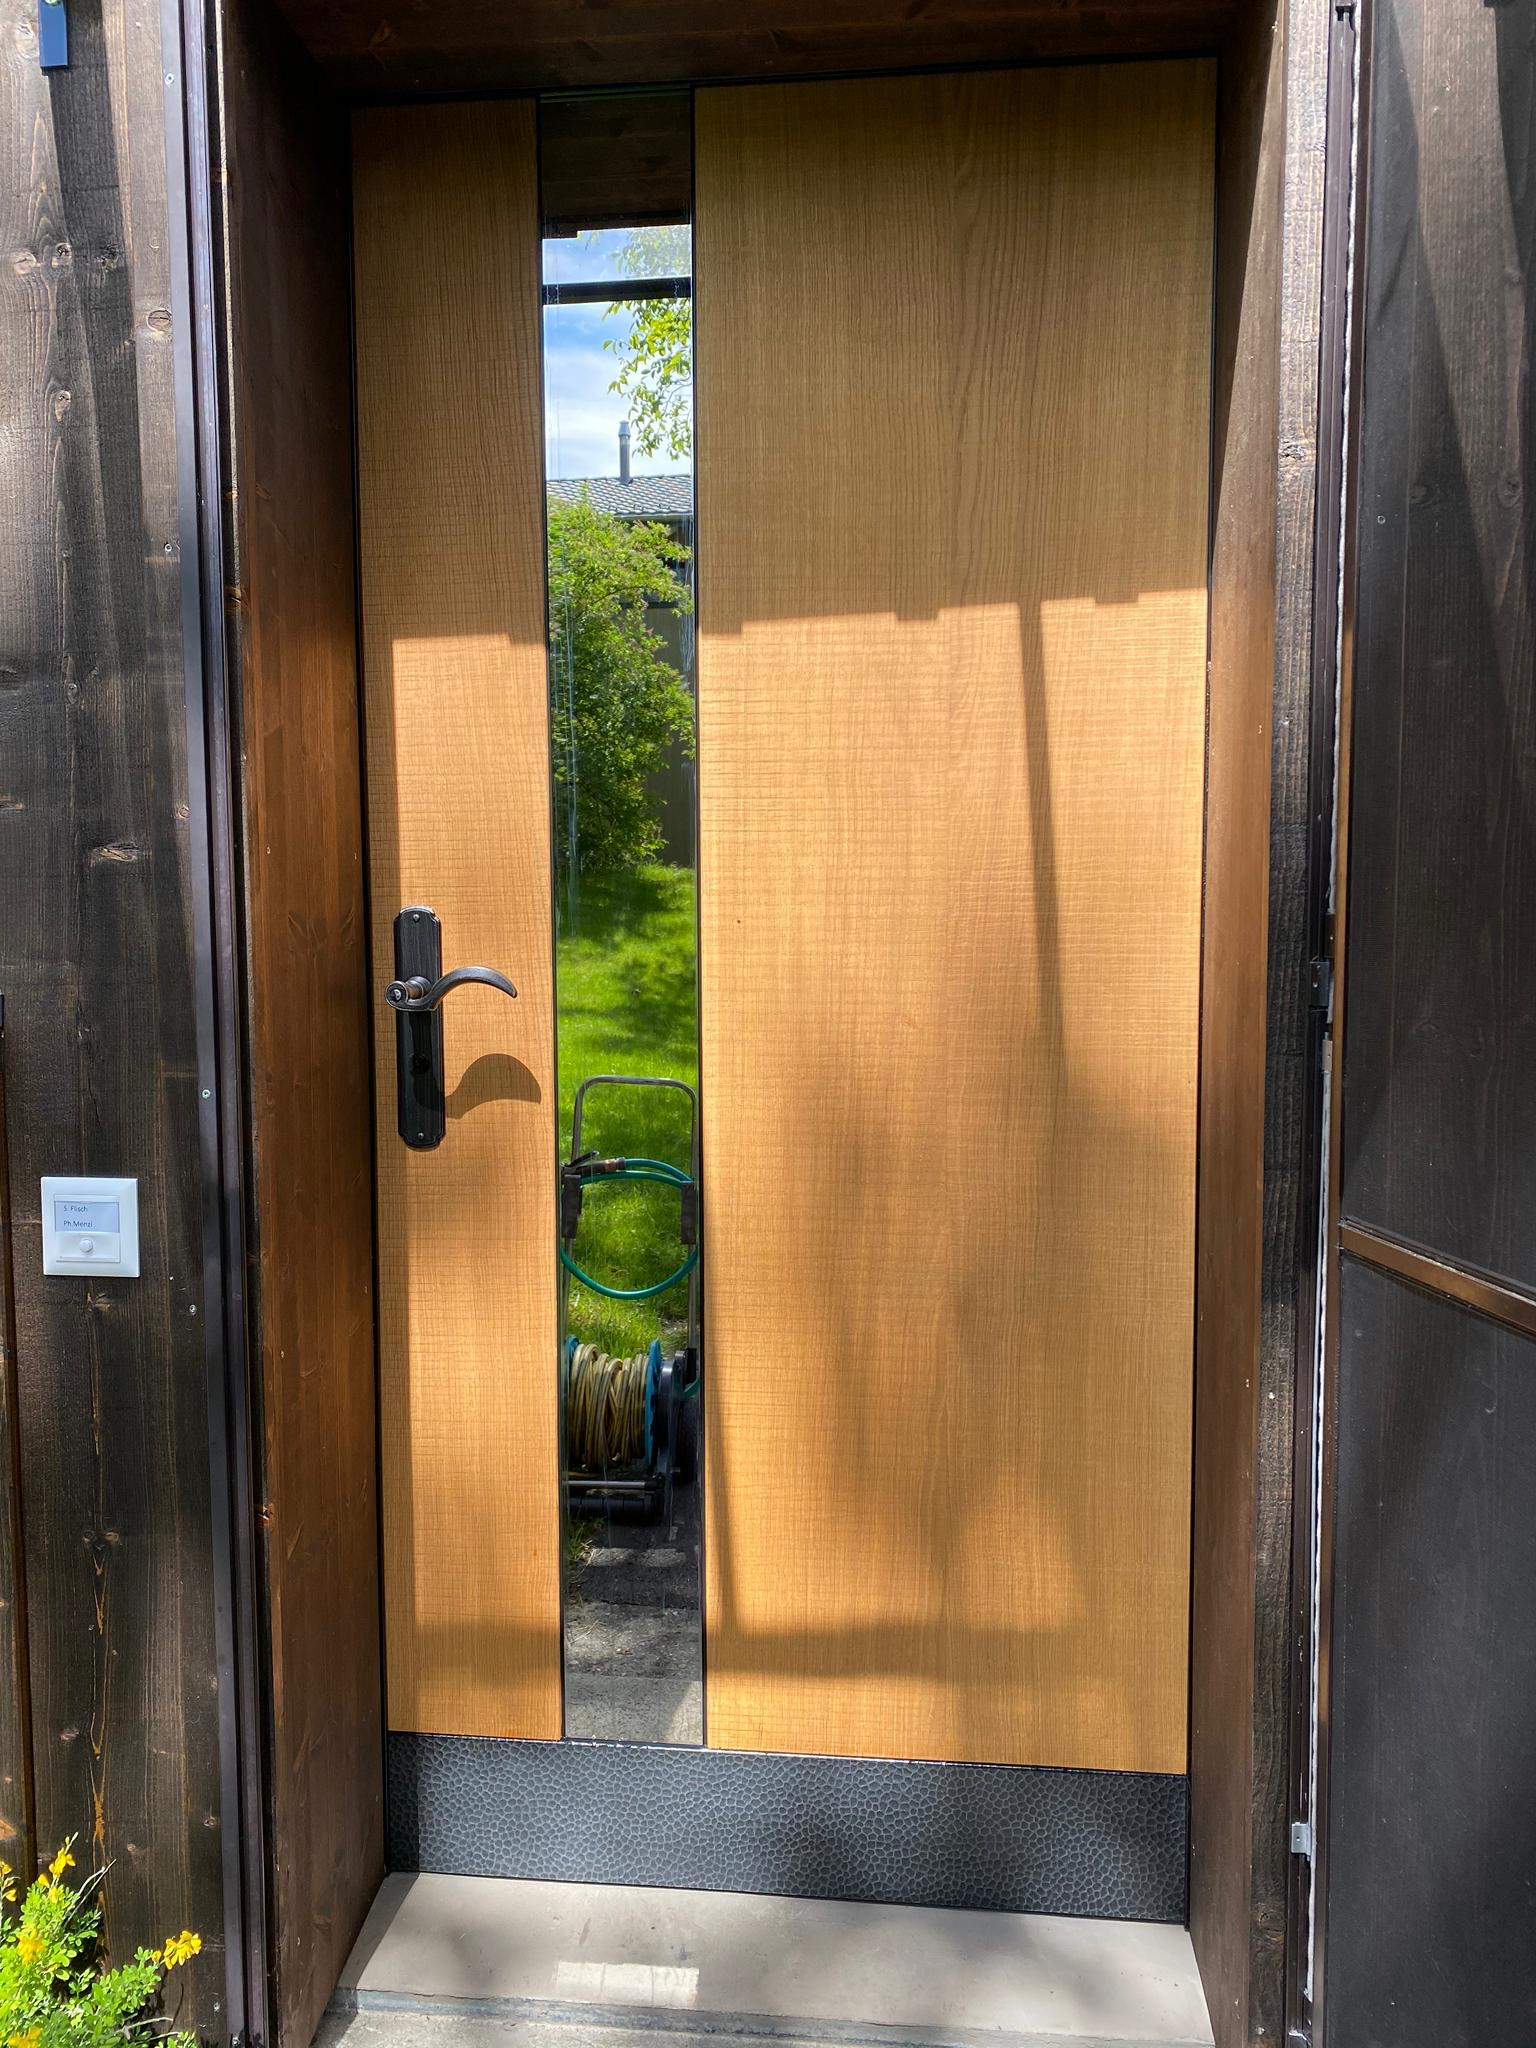 Bernhof-Haustüre in Frümsen mit Bandsägenschnitt